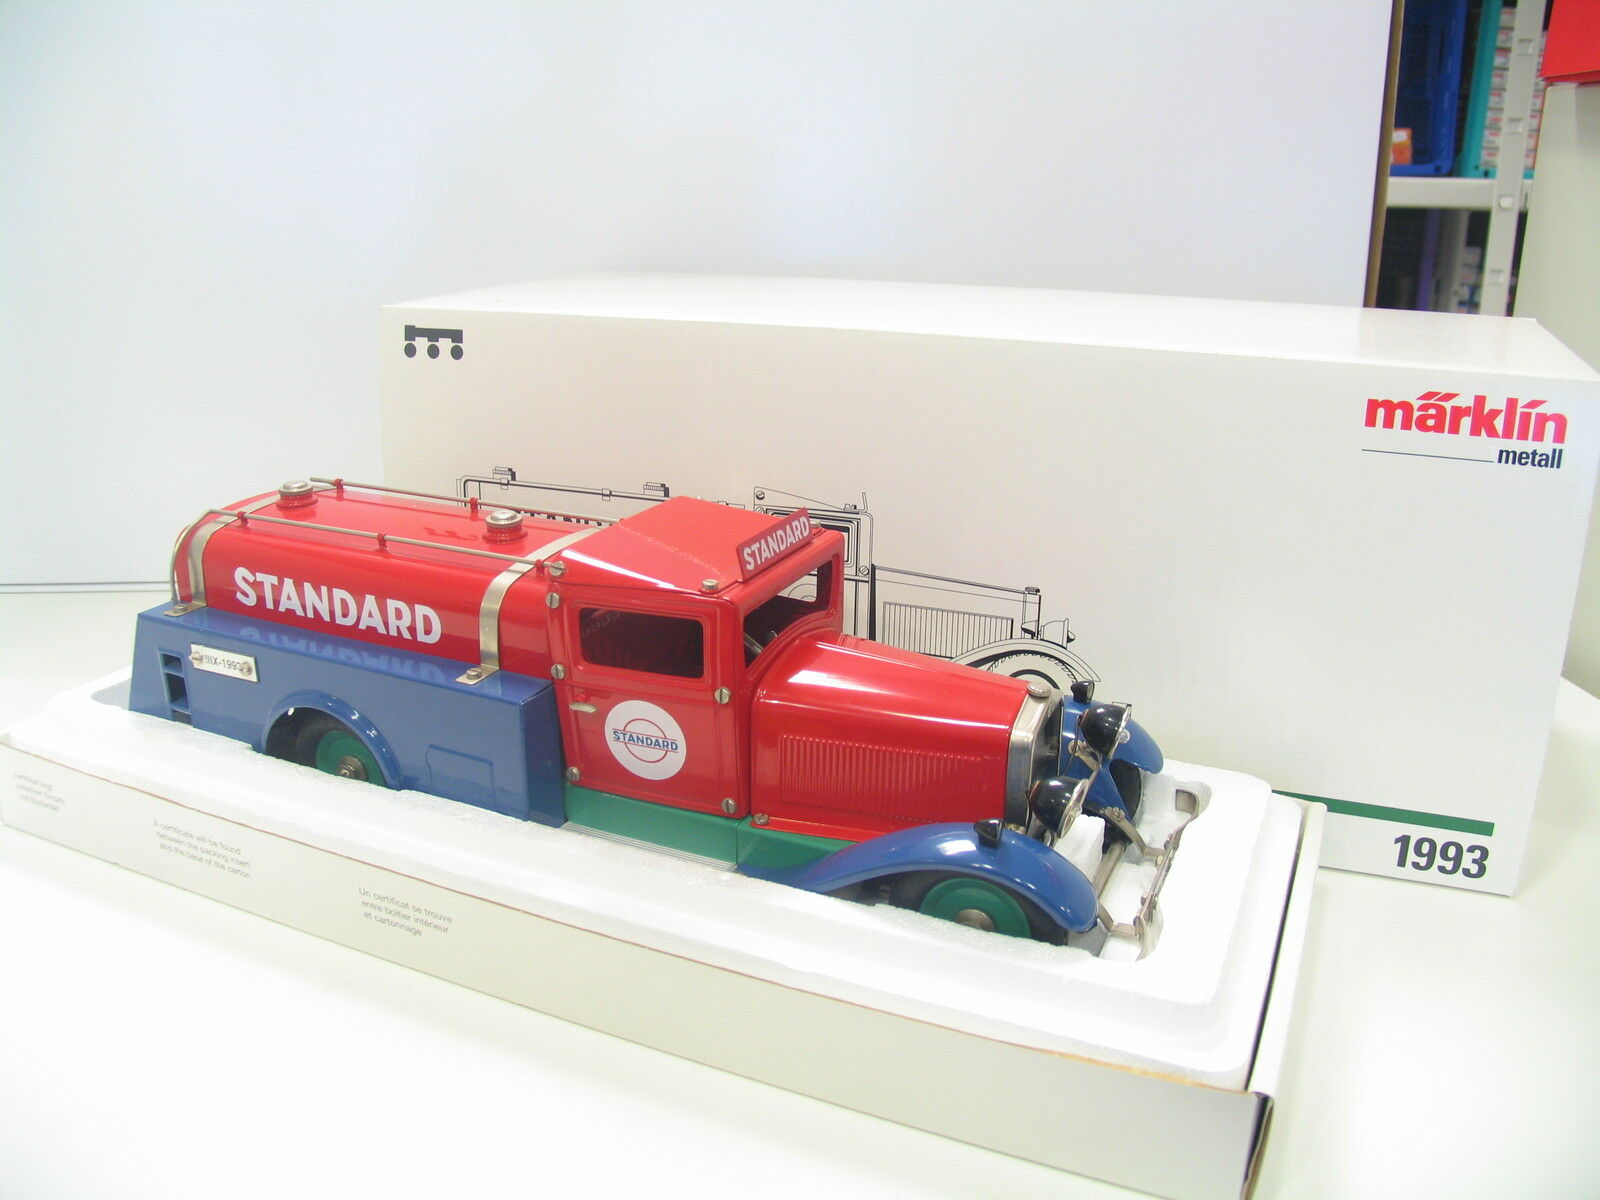 Märklin 1993  Camion Citerne Standard jl966  se hâta de voir